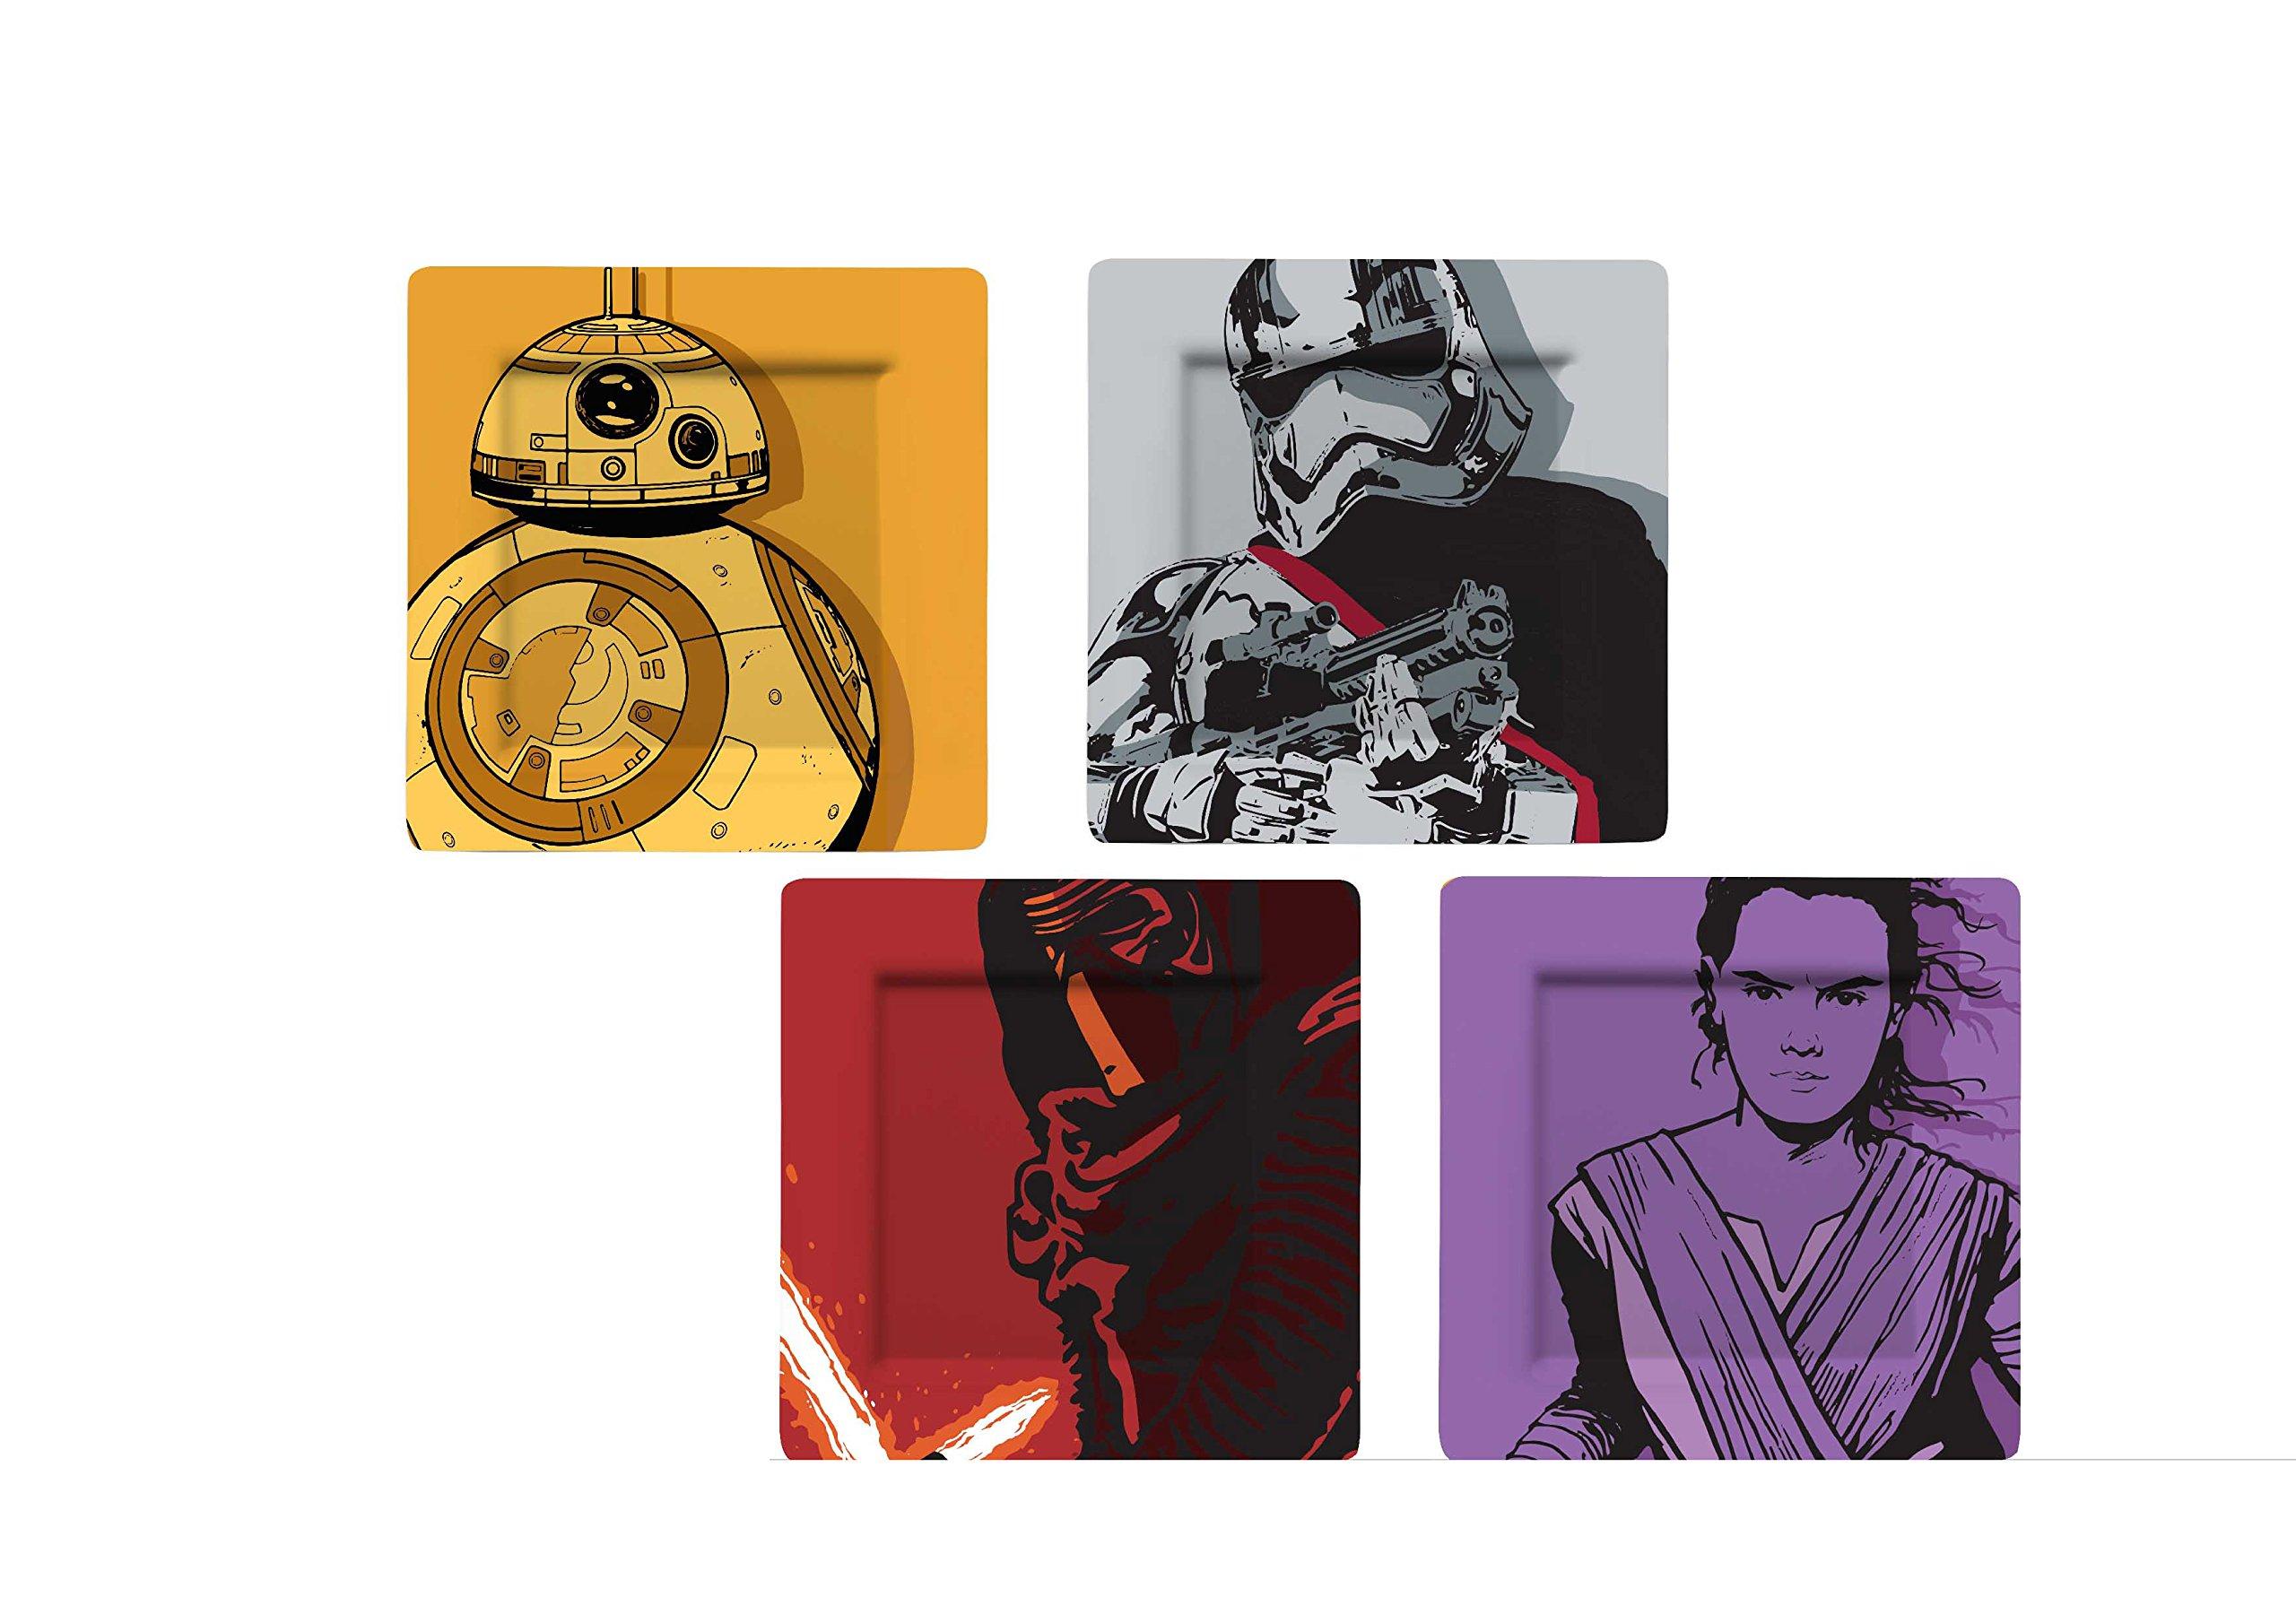 Star Wars Durable Melamine Plate Set (BB-8, Stormtrooper, Kylo Ren, Captain Phasma) Set of 4